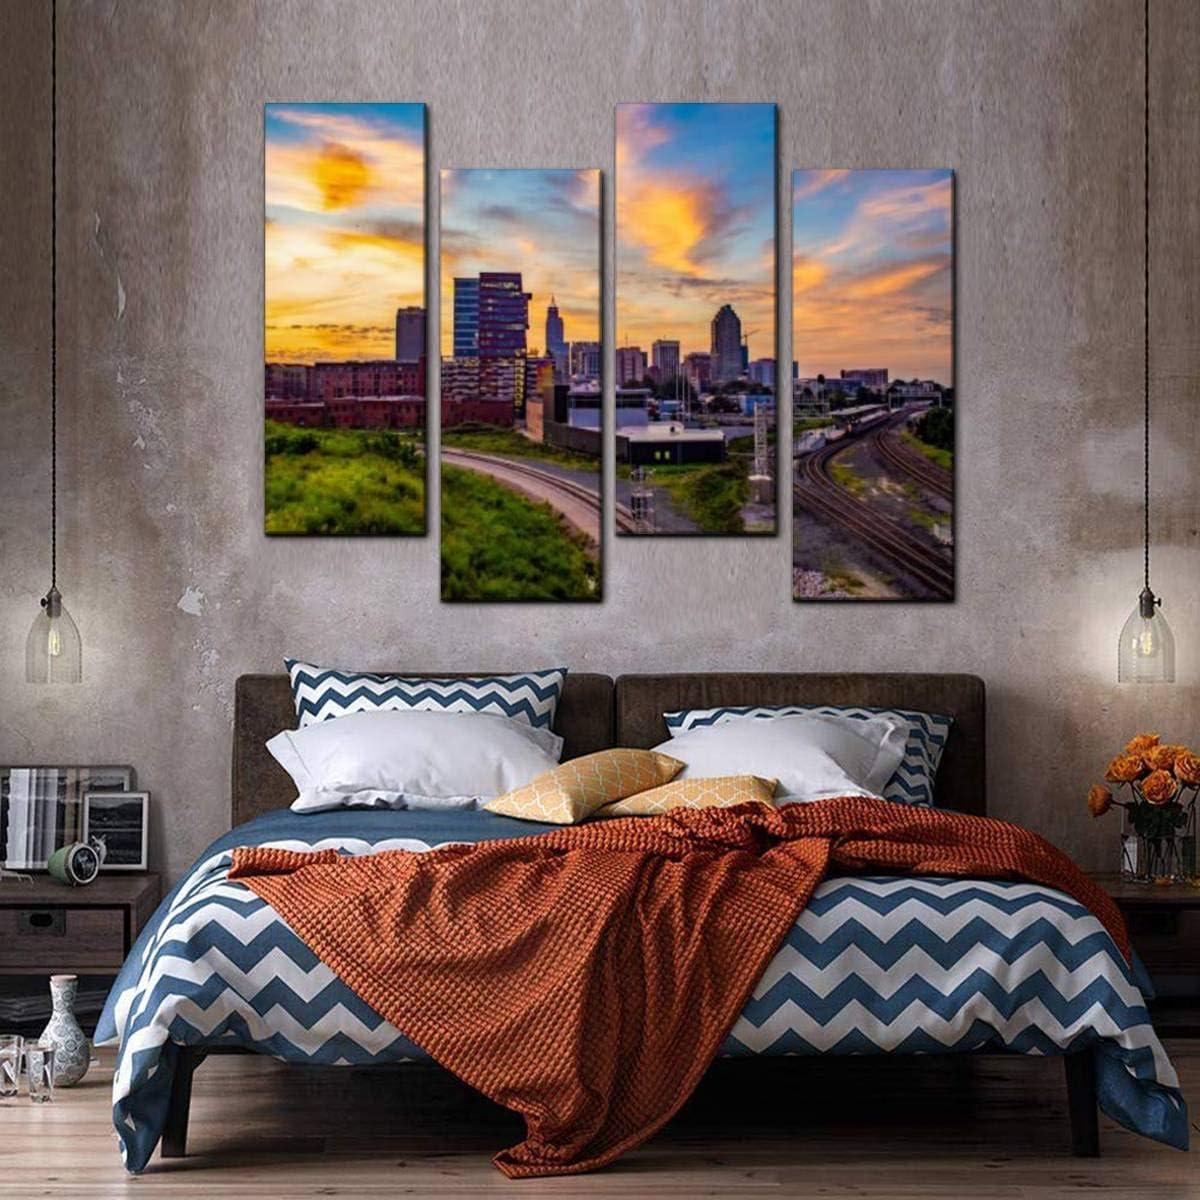 Raleigh,North Carolina,Metal Art,Skyline,Raleigh Art,Wall Art,Home Decor,Office Decor,NC State,Car Trails,City Skyline,Living Room Decor